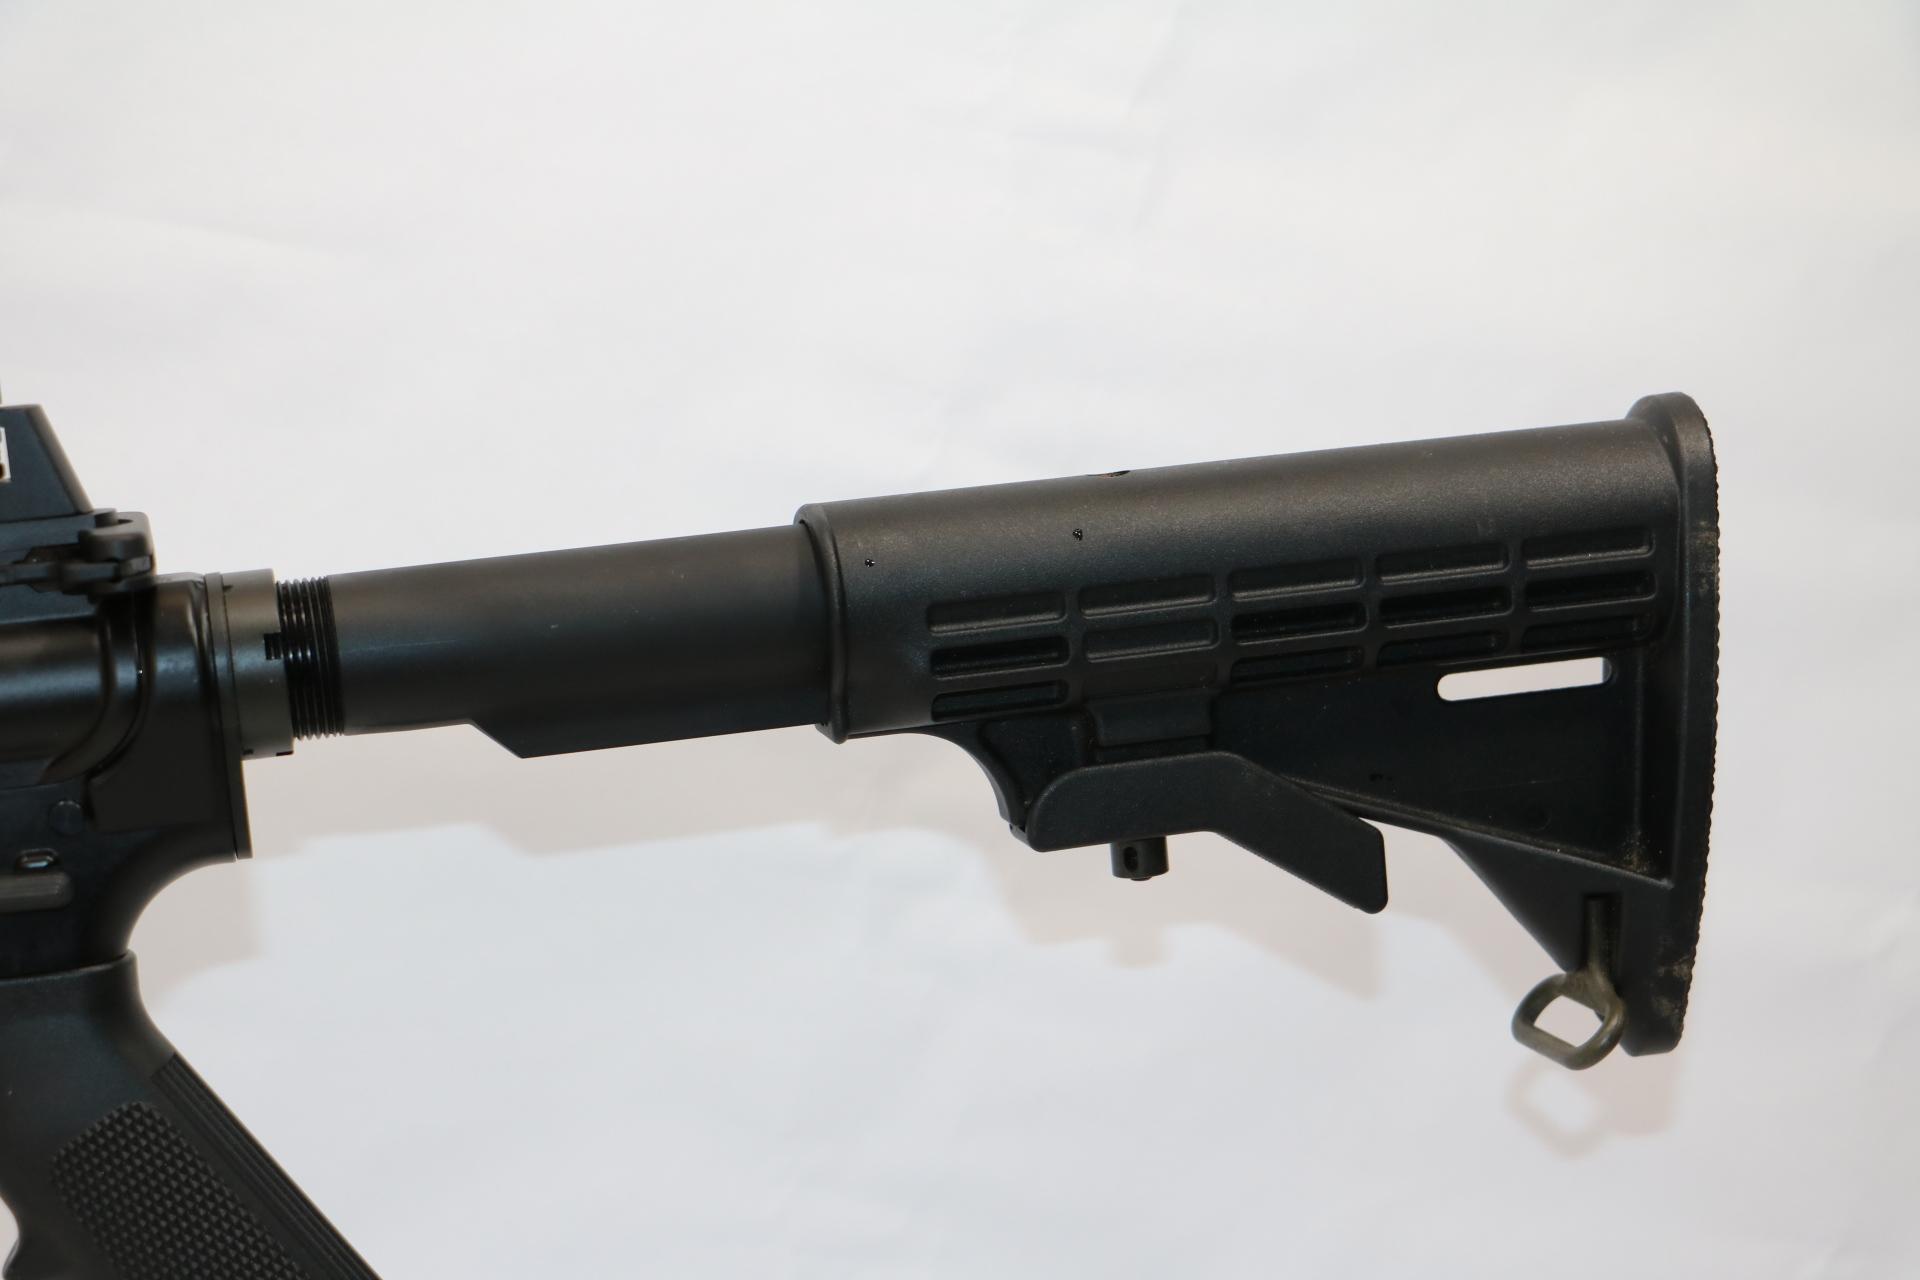 Bushmaster XM15-E2S 5.56/.223 AR15 - No Box-img-7